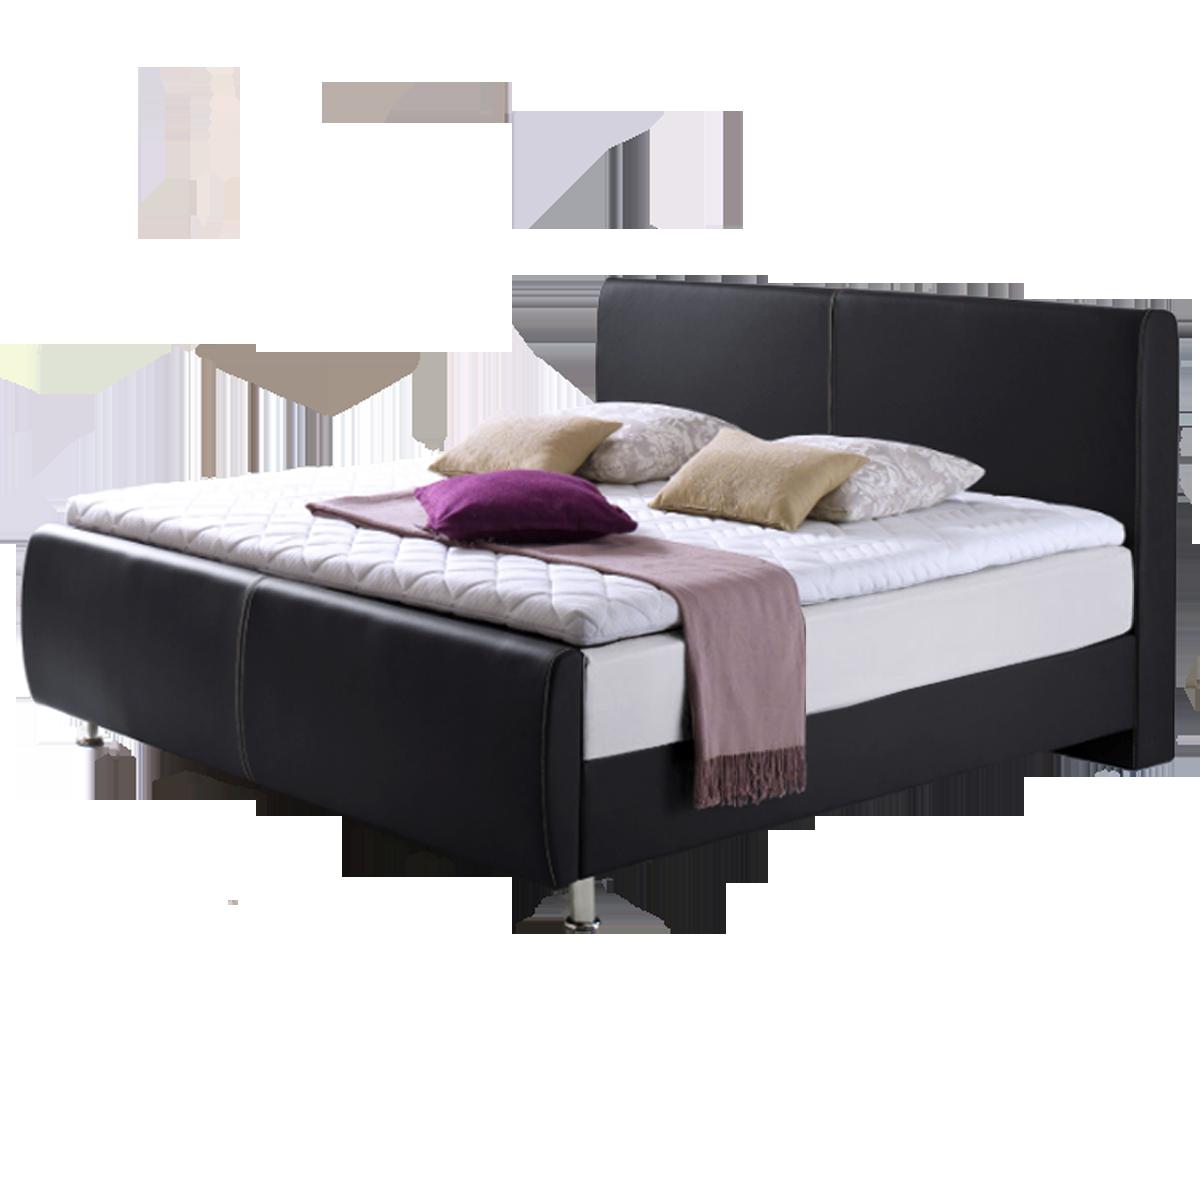 meise m bel boxspringbett amadeo mit kunstlederbezug farbe. Black Bedroom Furniture Sets. Home Design Ideas